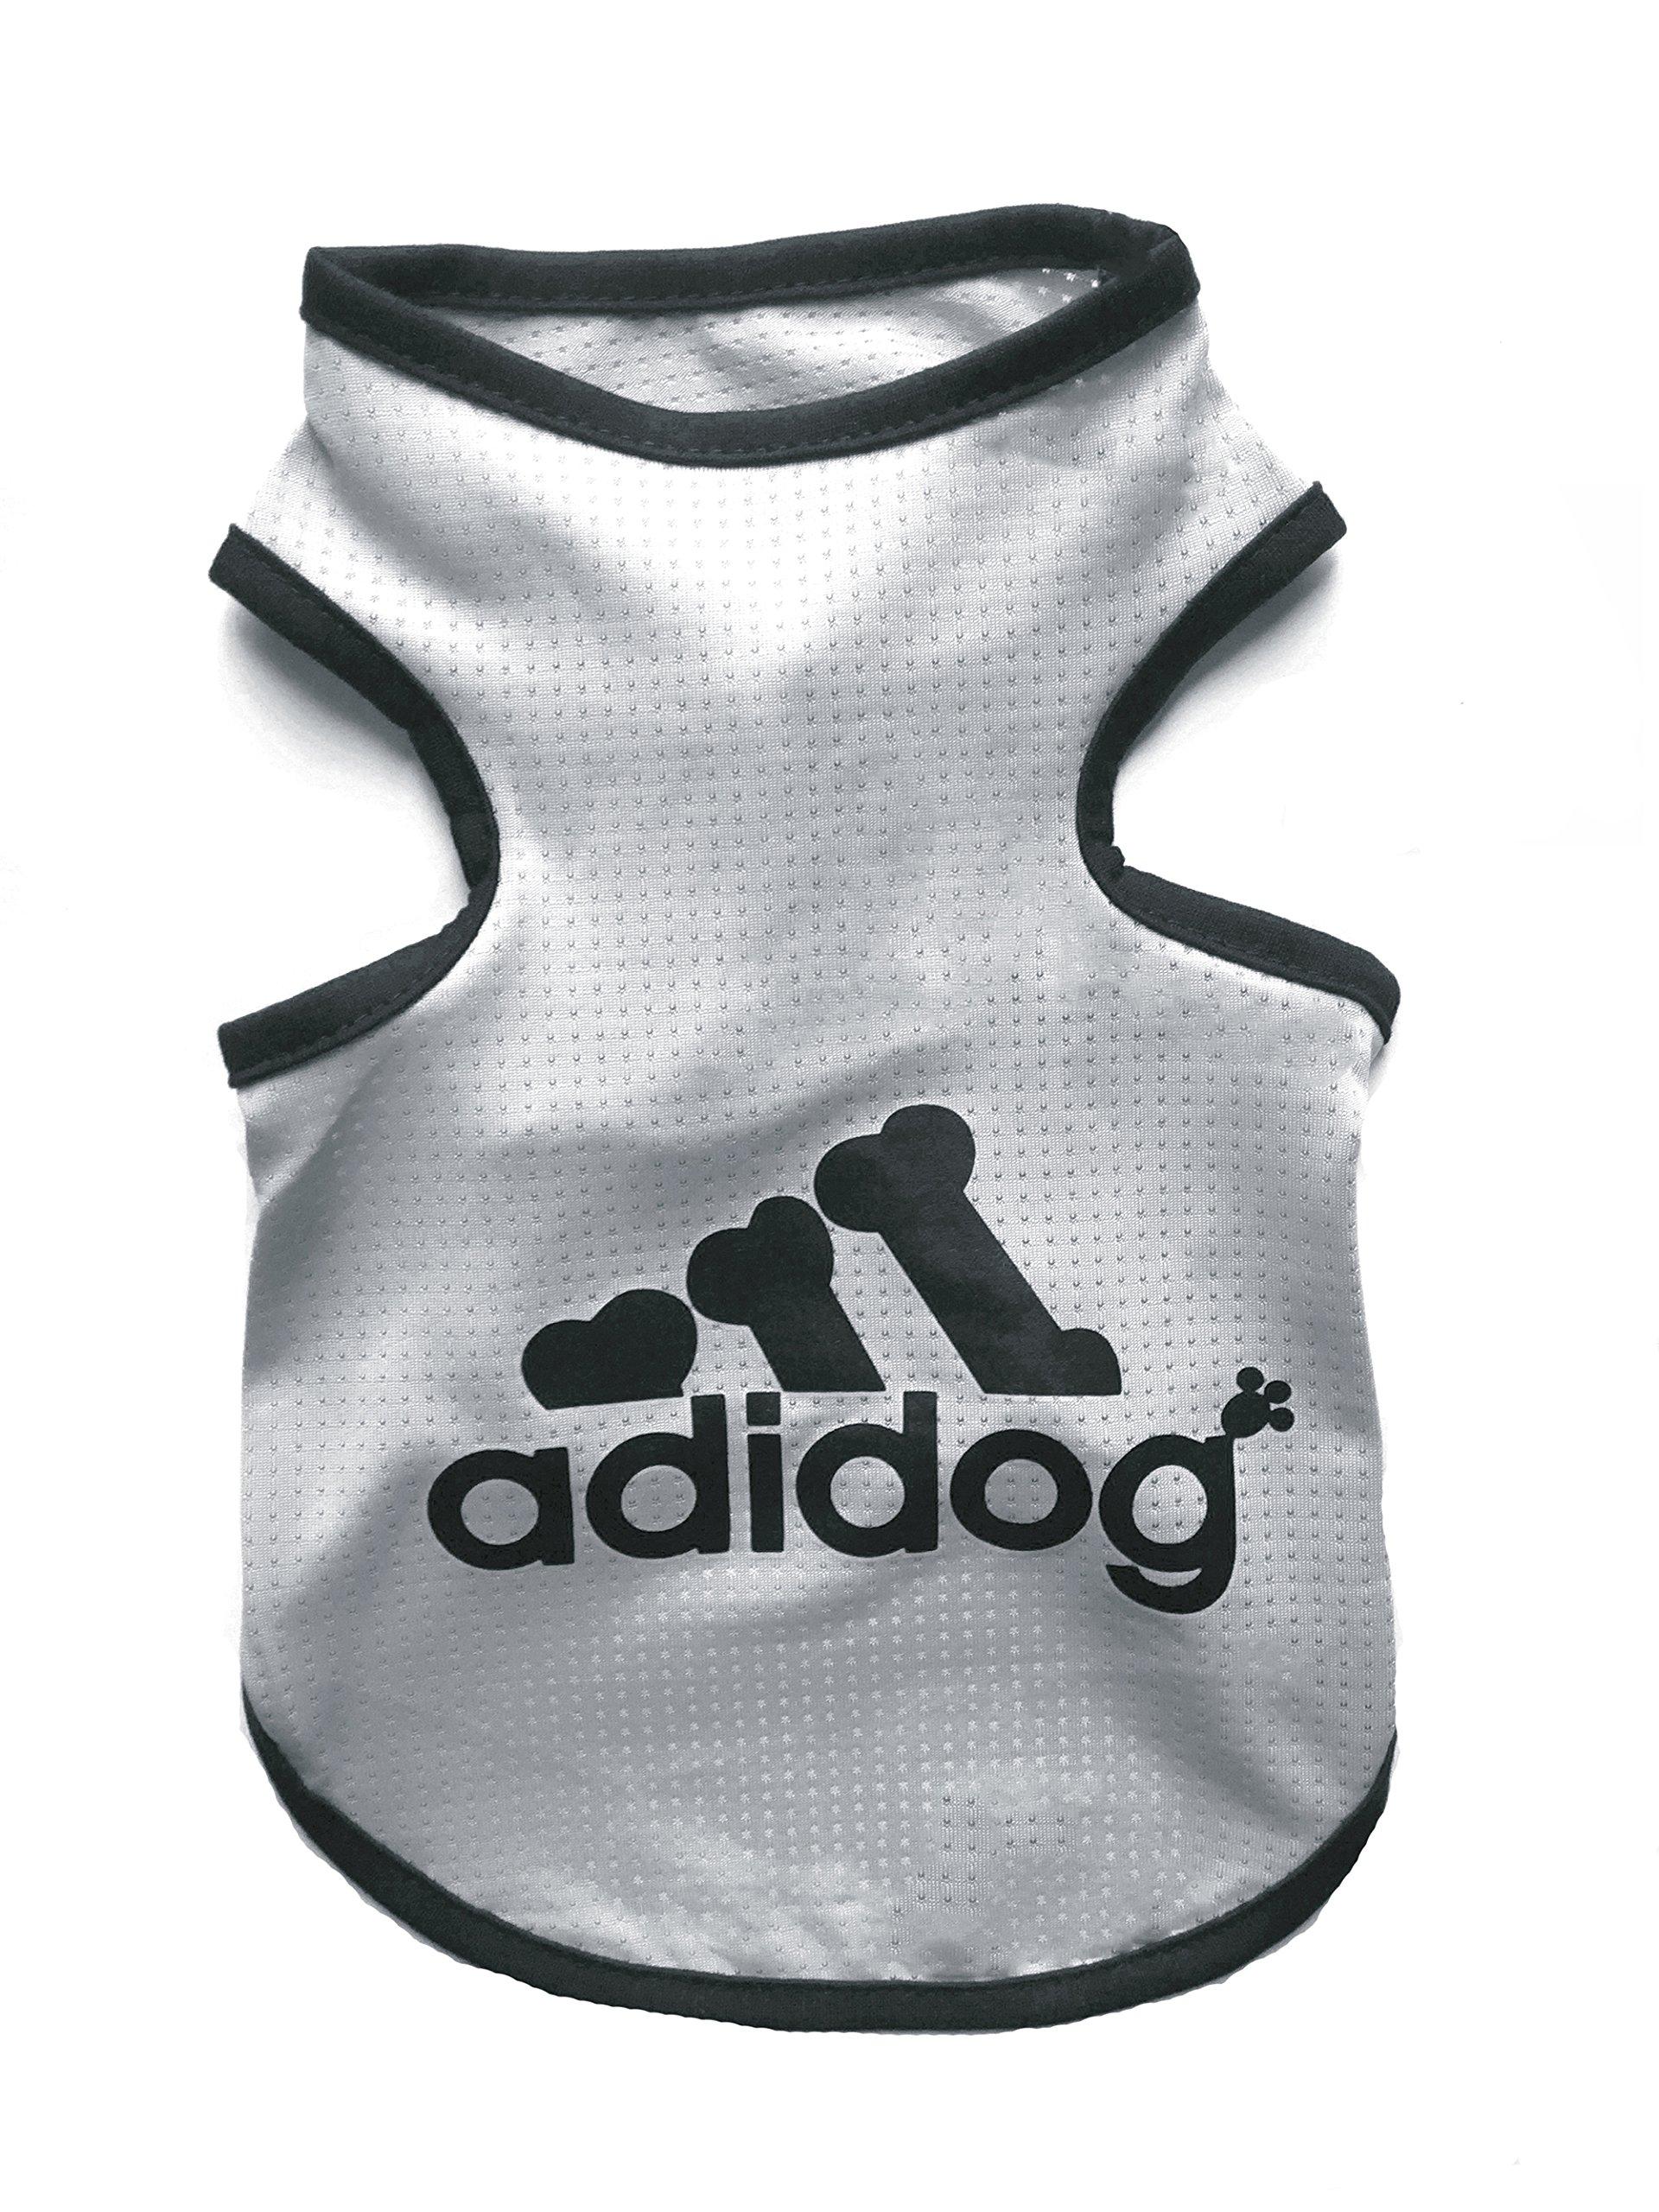 Rdc Pet Adidog Dog T Shirt, Dog Shirts, Dog Clothes Summer Tank Top Vest from S to 9X-Large for Small dog, Medium Dog, Large Dog (Grey, 7XL)